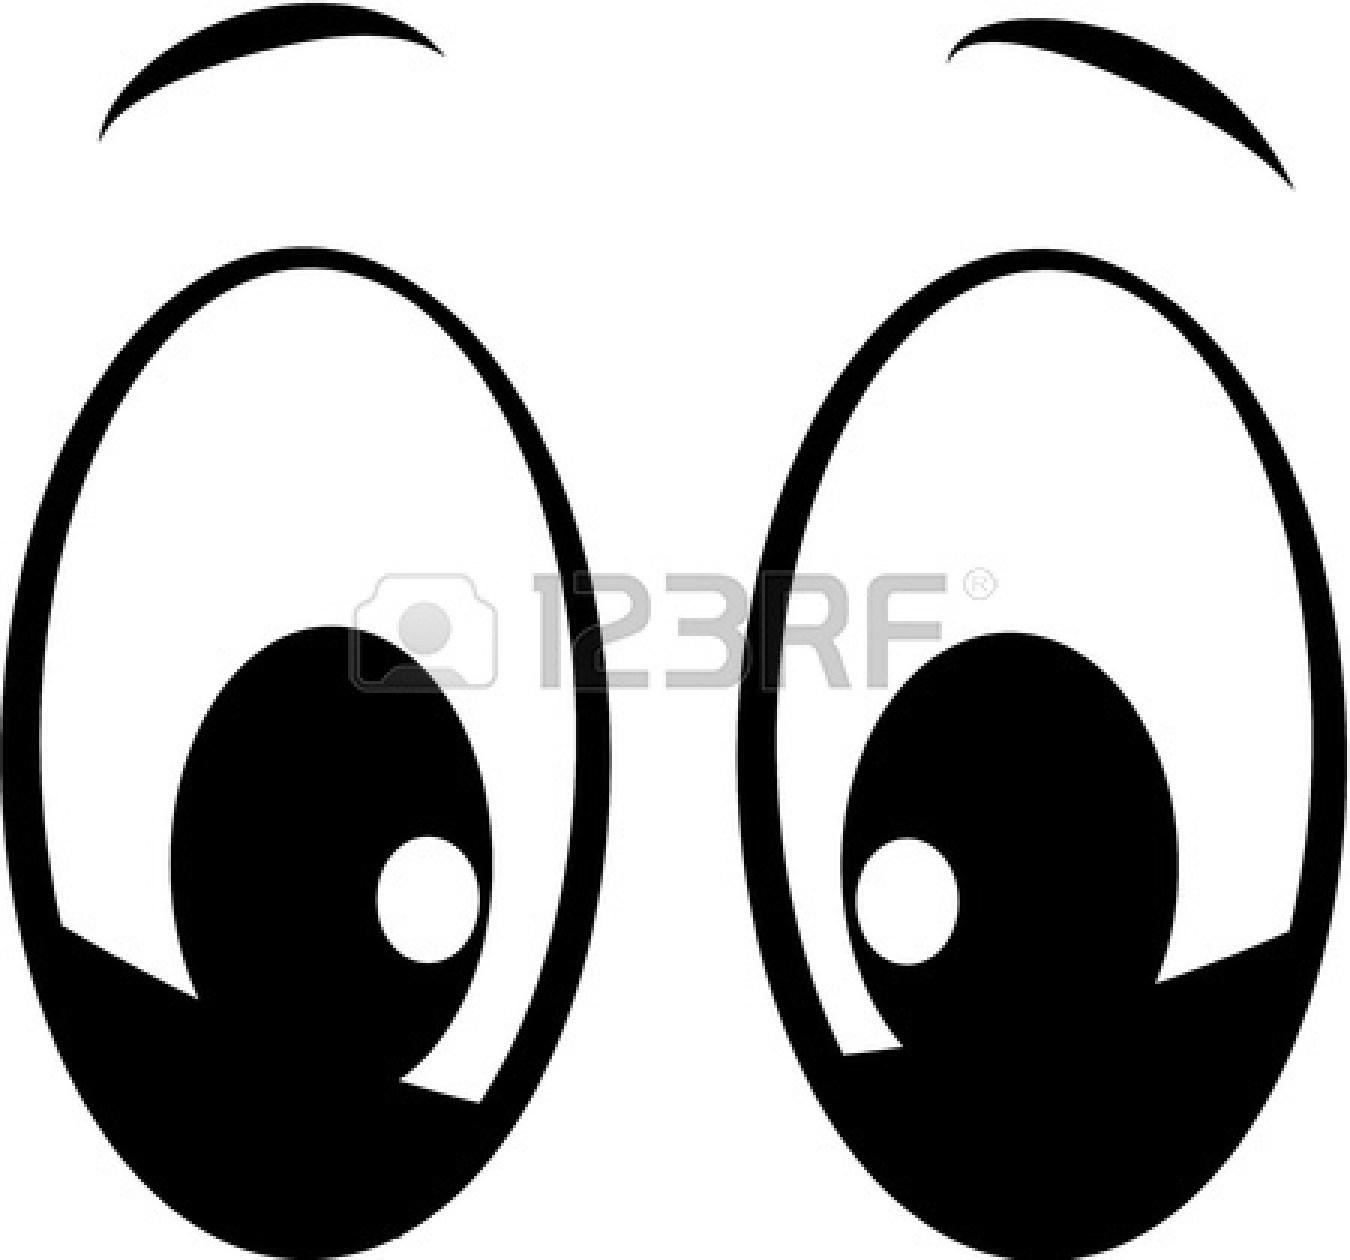 Clipart eyes looking down jpg transparent library Clipart eyes looking down 5 » Clipart Portal jpg transparent library